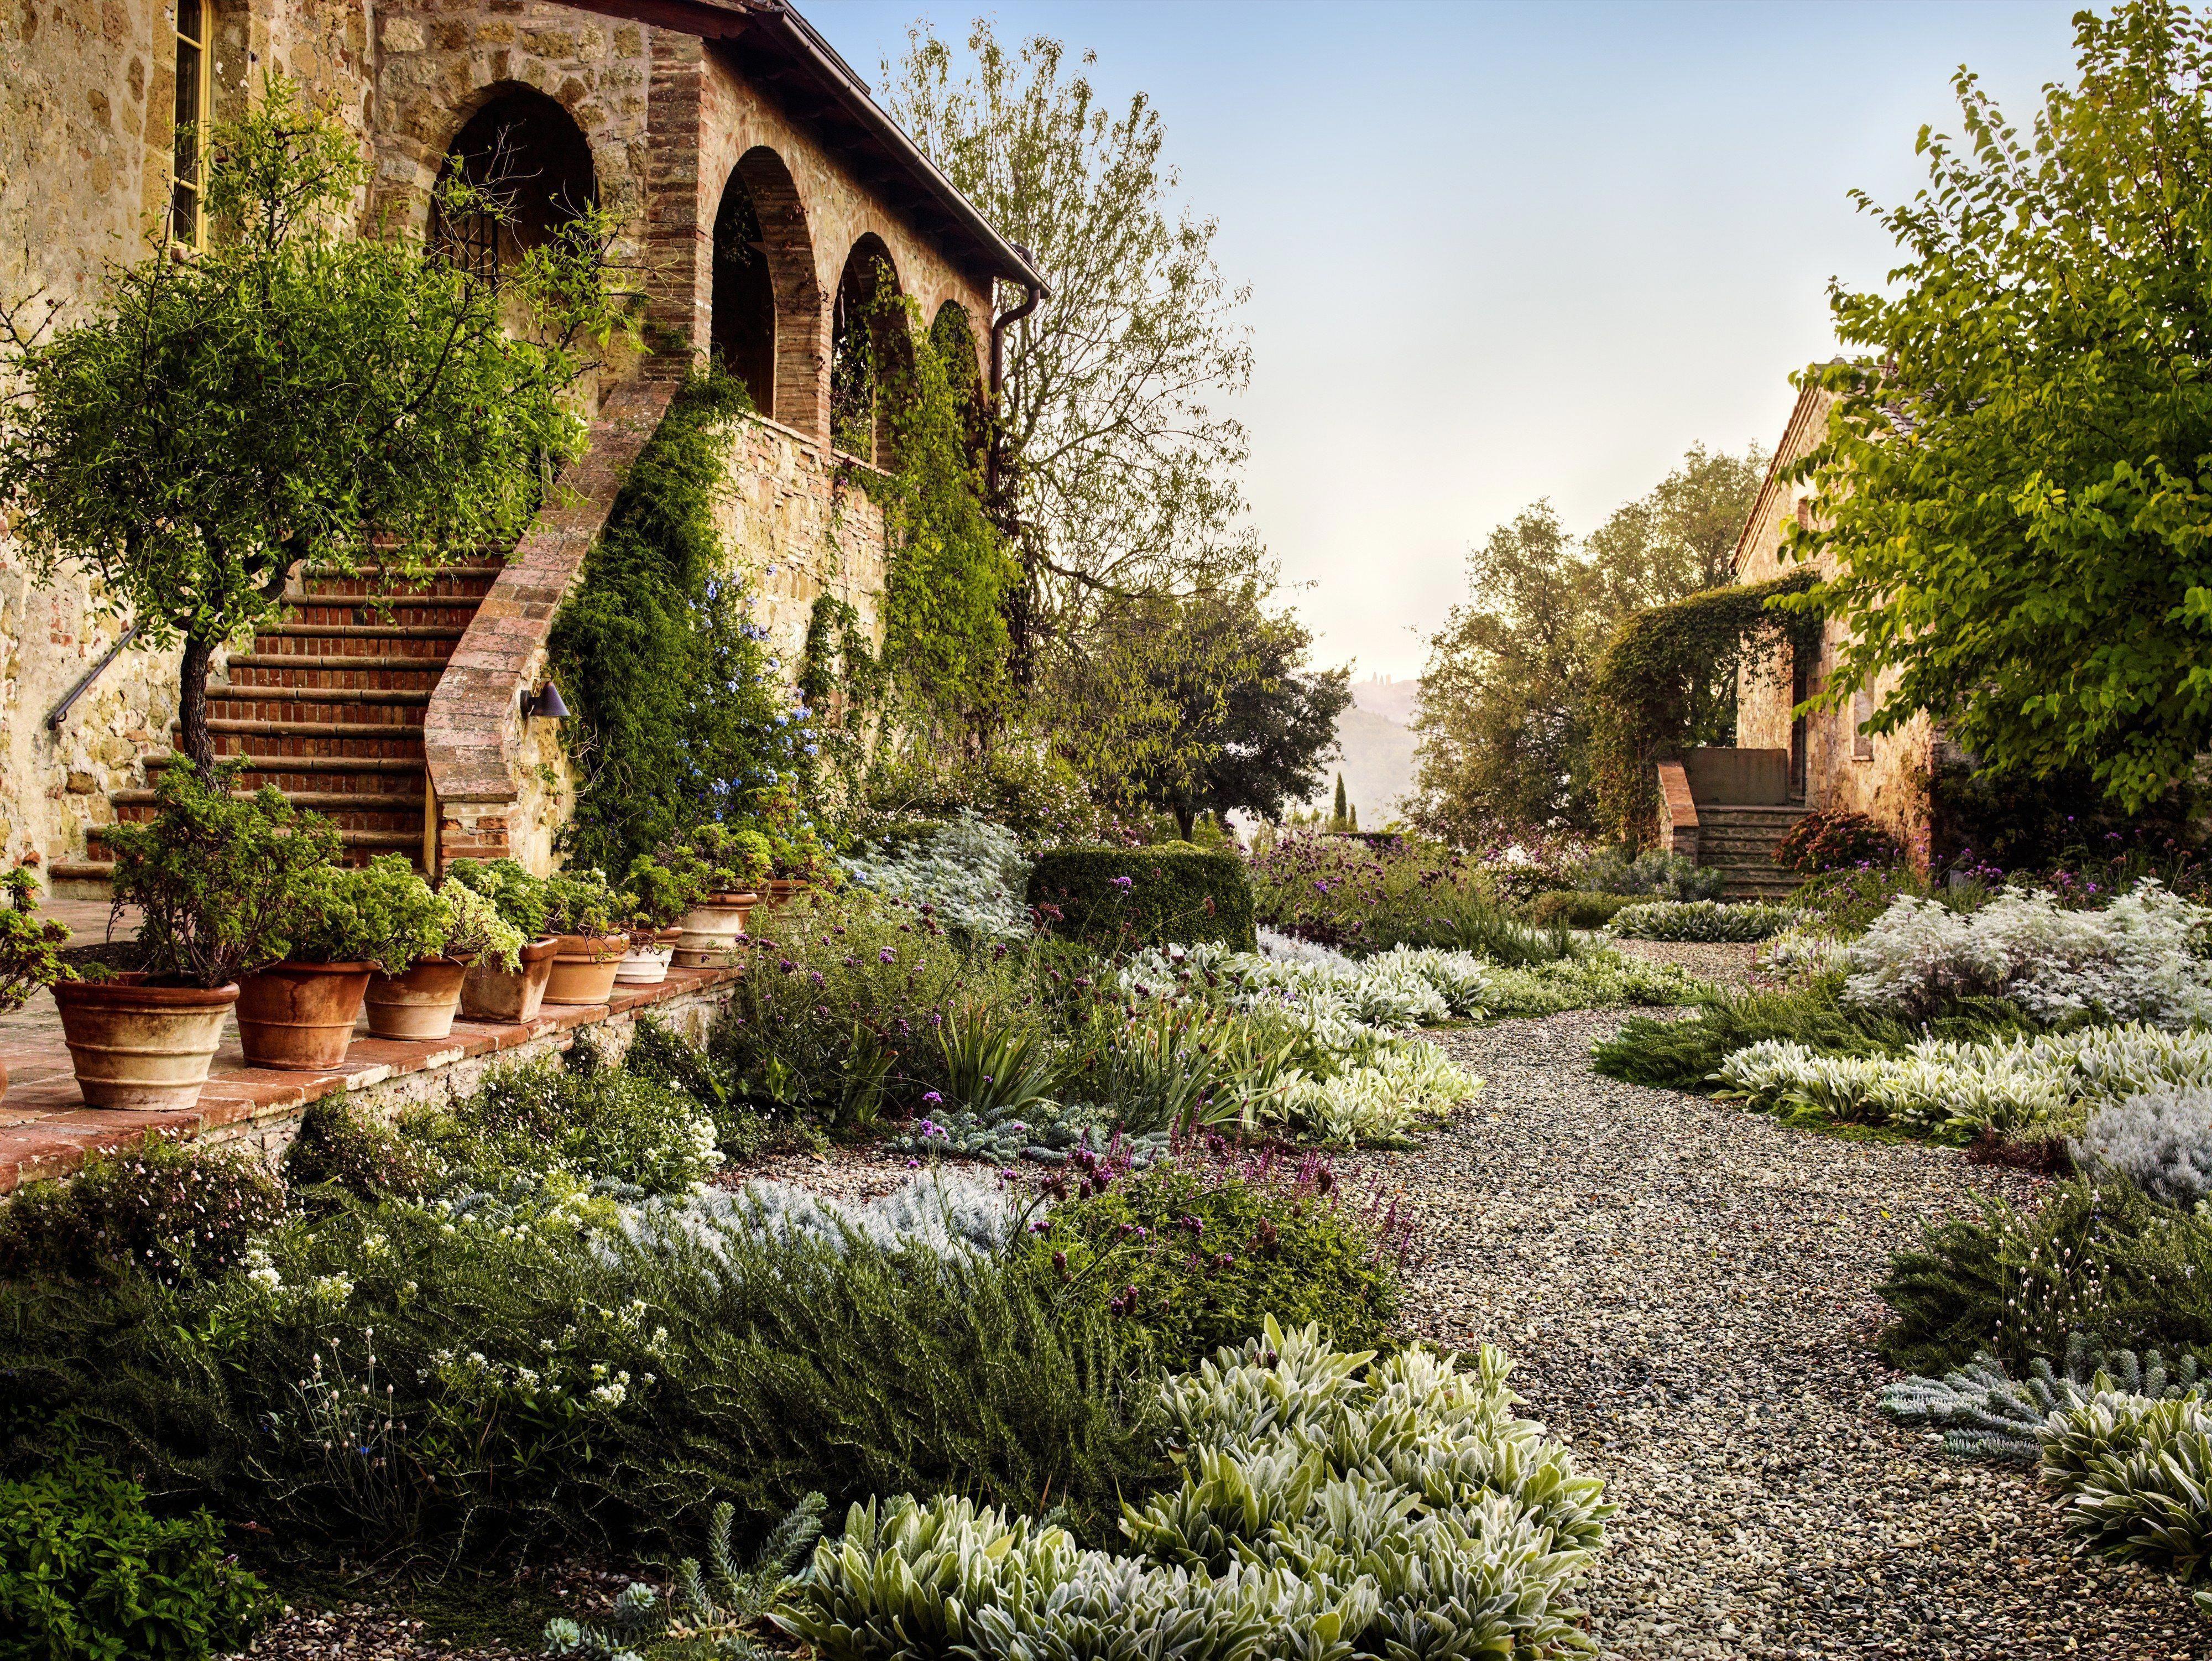 Tuscandesign Mediterranean Garden Design Tuscan Garden Tuscan Landscaping